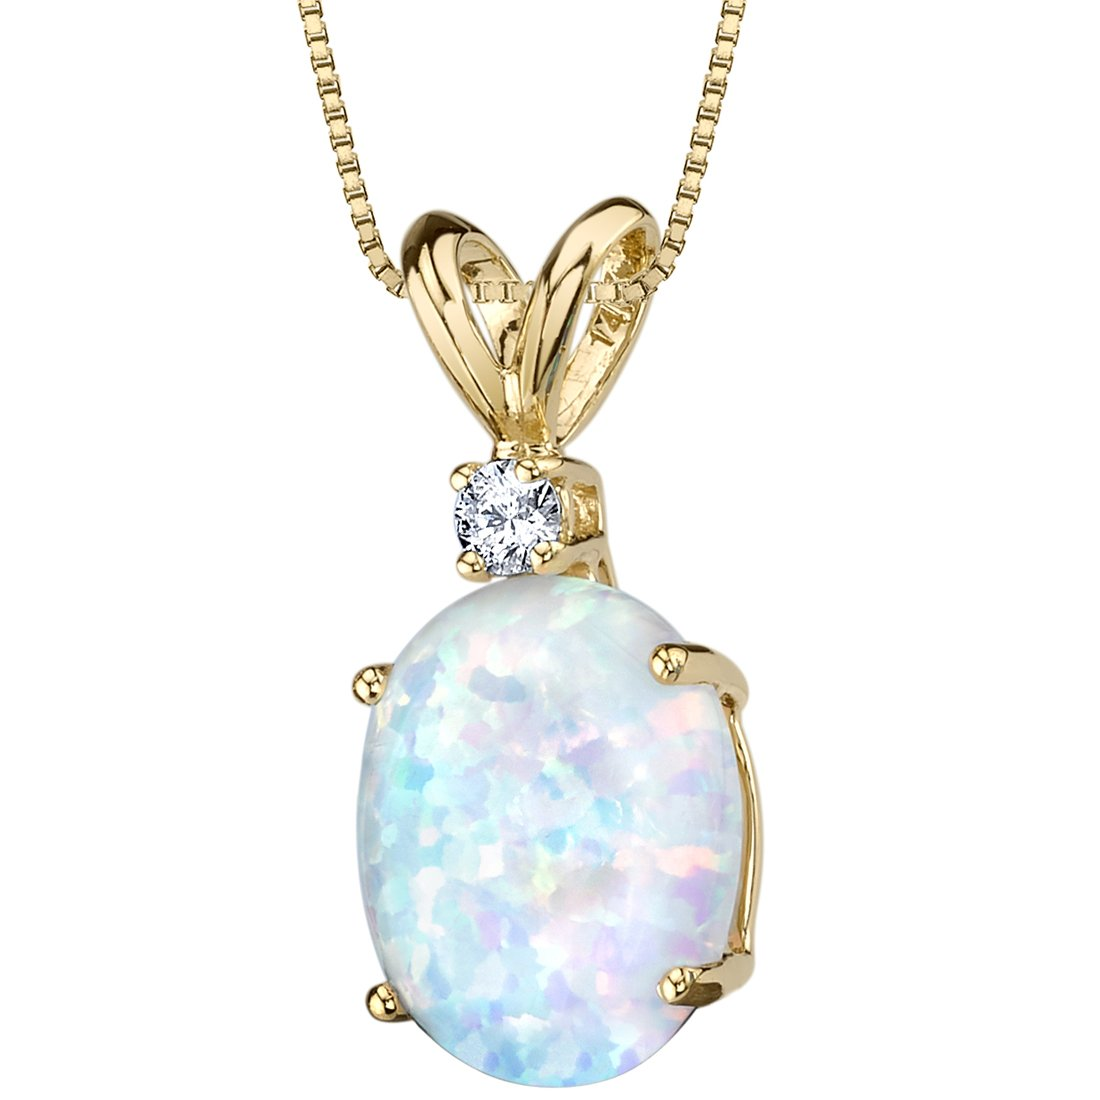 2c5c72bef6c Amazon.com  14 Karat Yellow Gold Oval Shape Created Opal Diamond Pendant   Jewelry